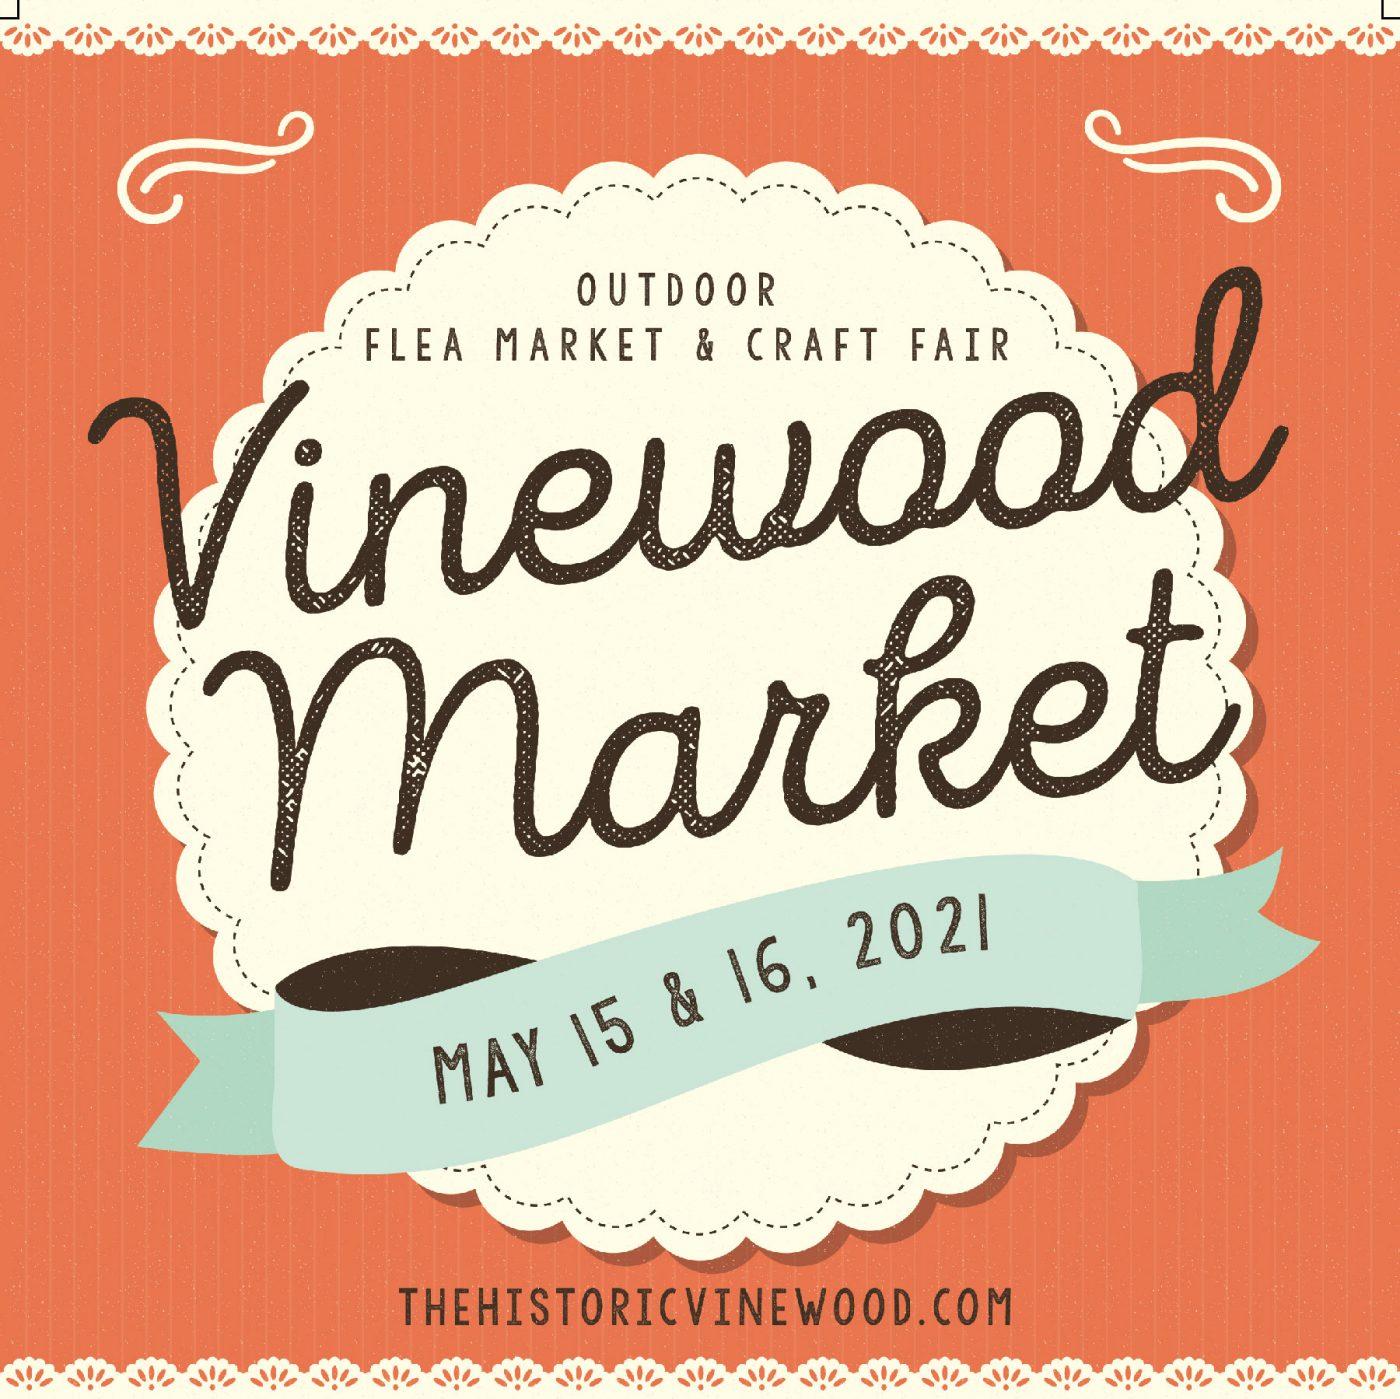 Vinewood Market May 2021